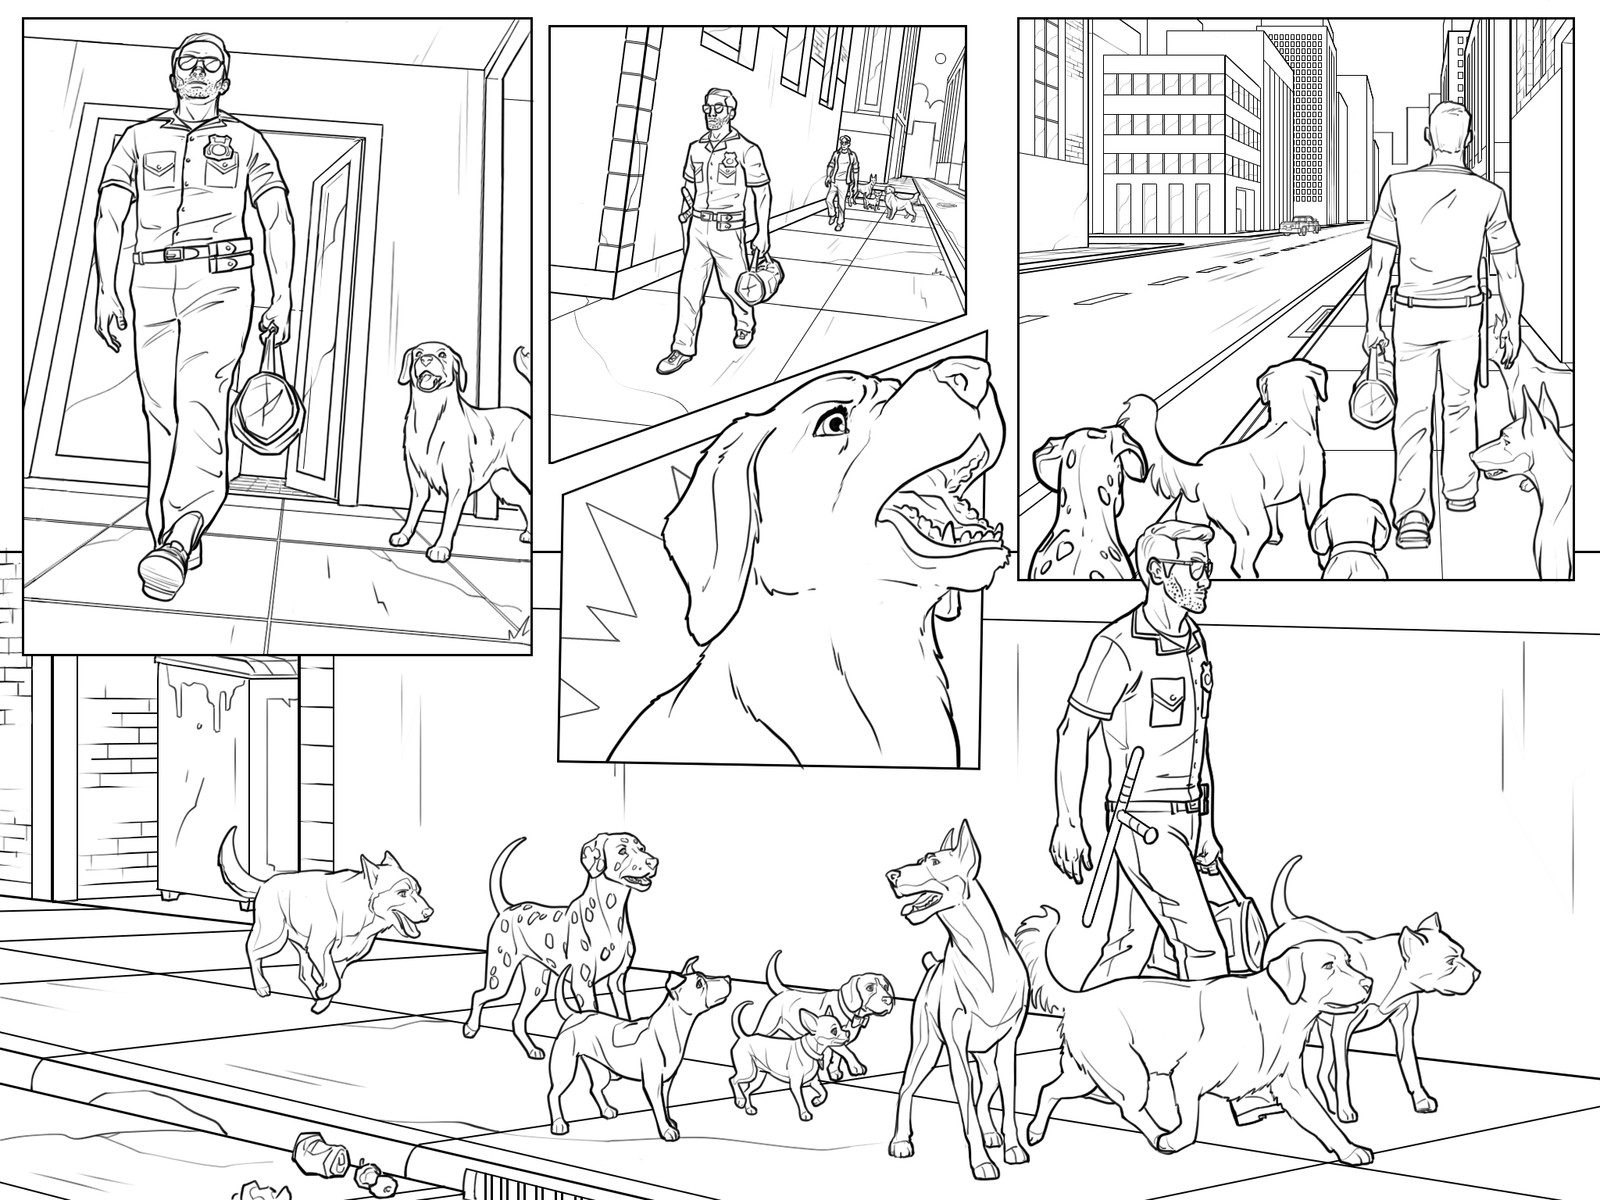 Get 'Em game cutscene comics Pg 16 Inks  Behdad Sami Interactive © 2018